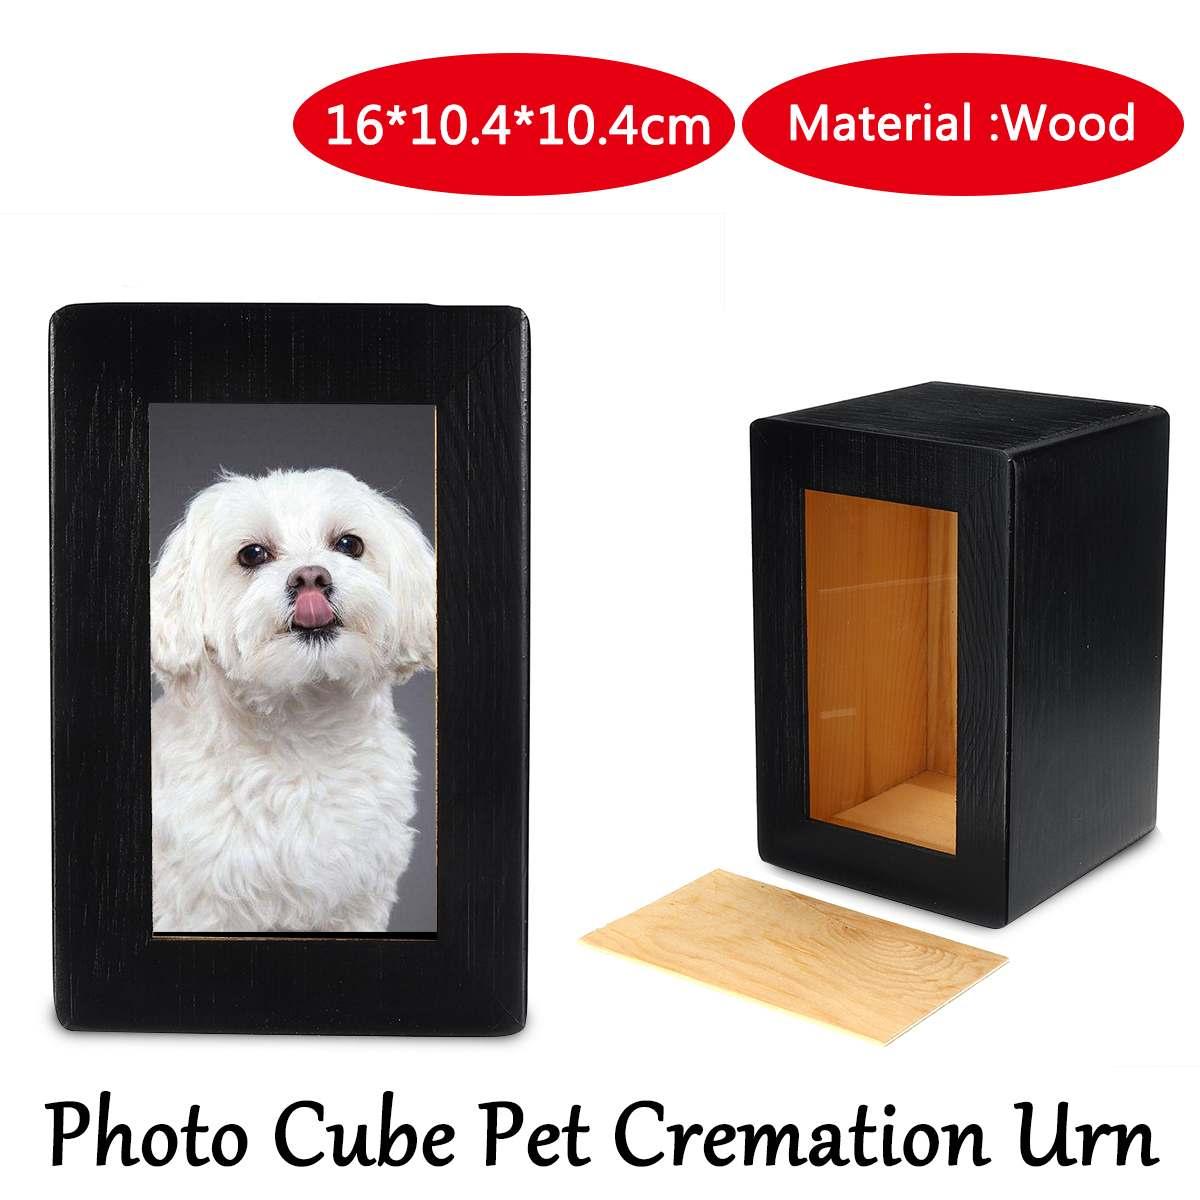 10.4x10.4x16cm Wooden Photo Cube Pet Cremation Black Urn Pet memorial keepsake Urn For Pet Picture Ashes